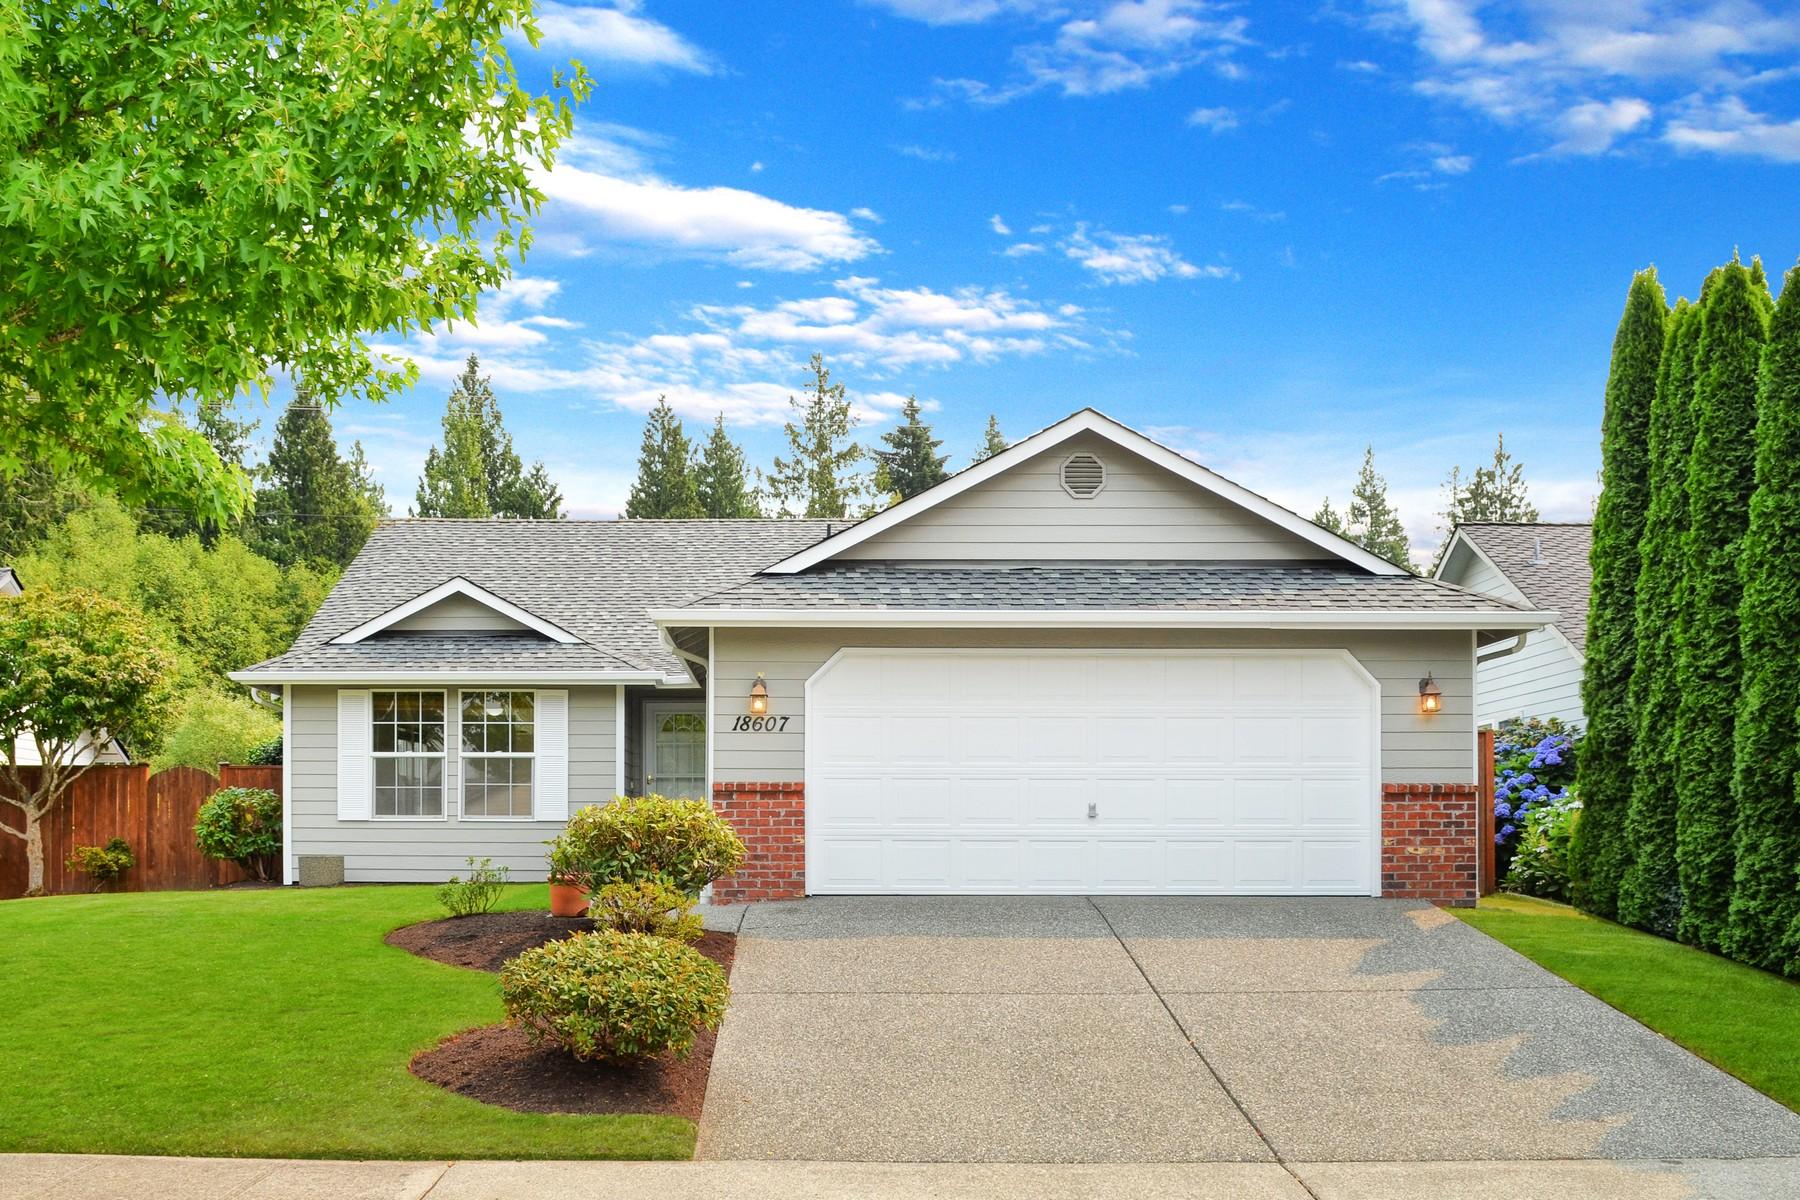 Single Family Home for Sale at Charming Arlington Rambler 18607 Ballantrae Drive Arlington, Washington, 98223 United States